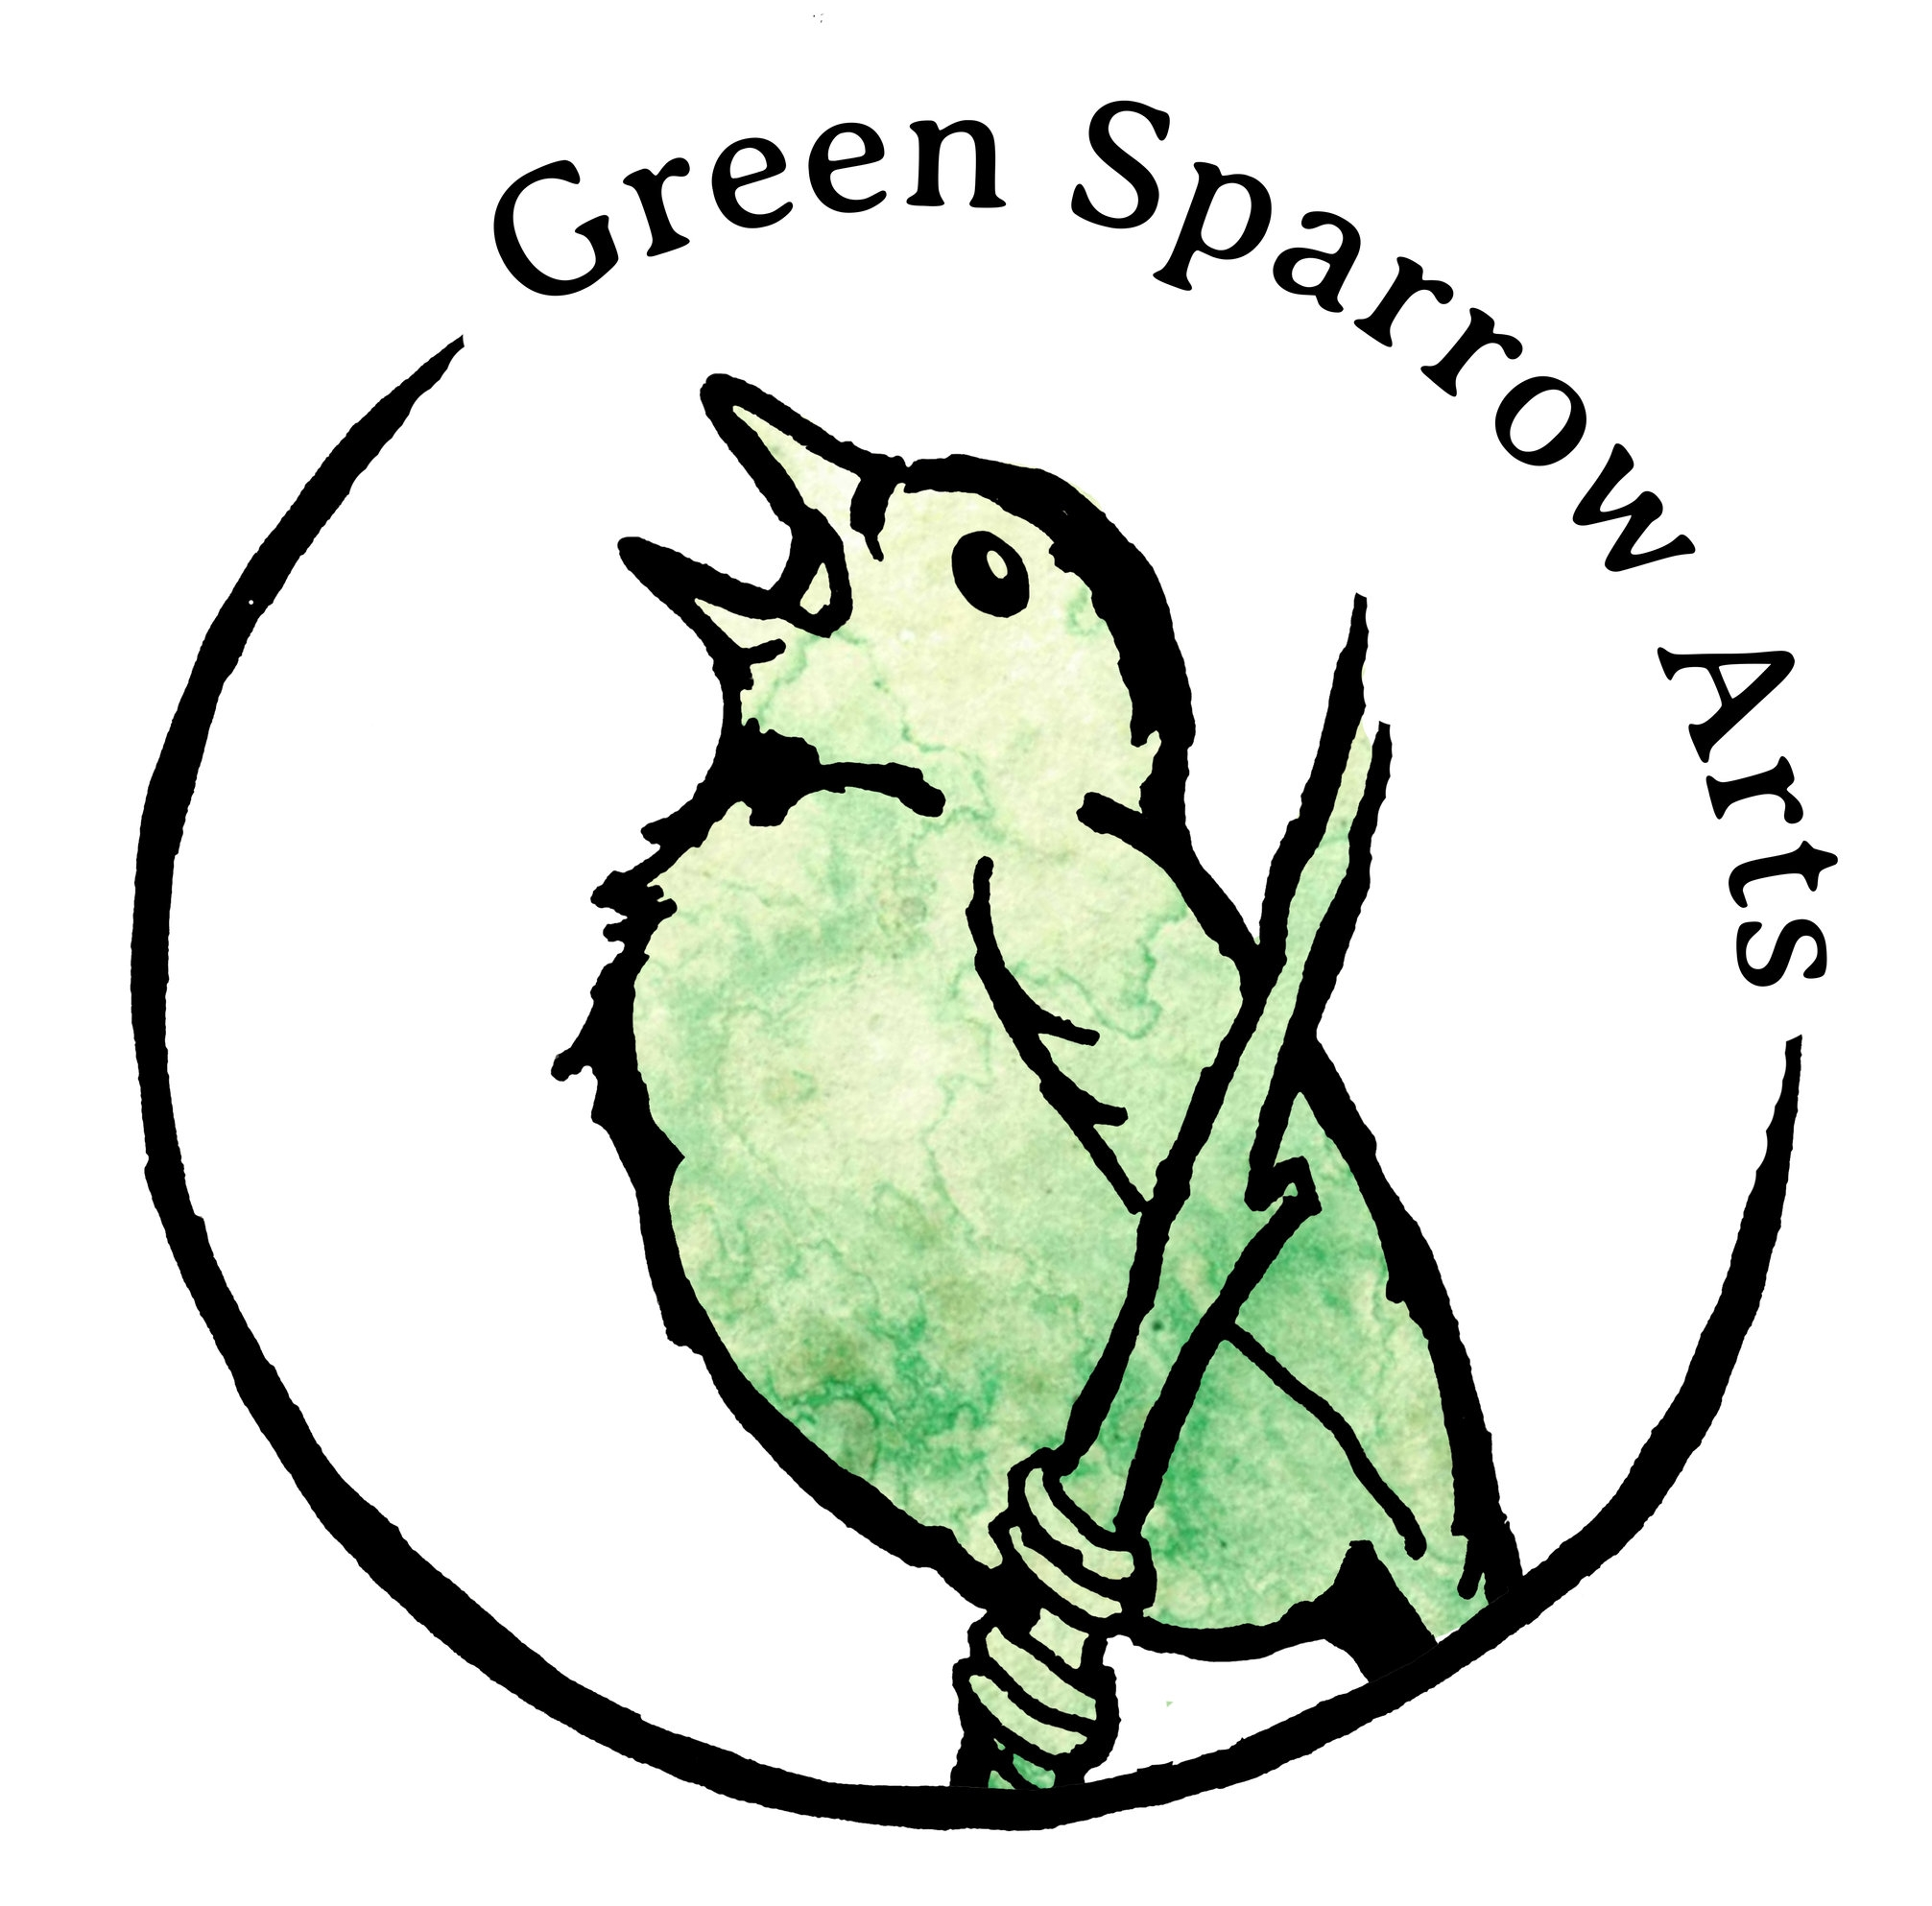 Final_green bird_in circle_arked text.jpg